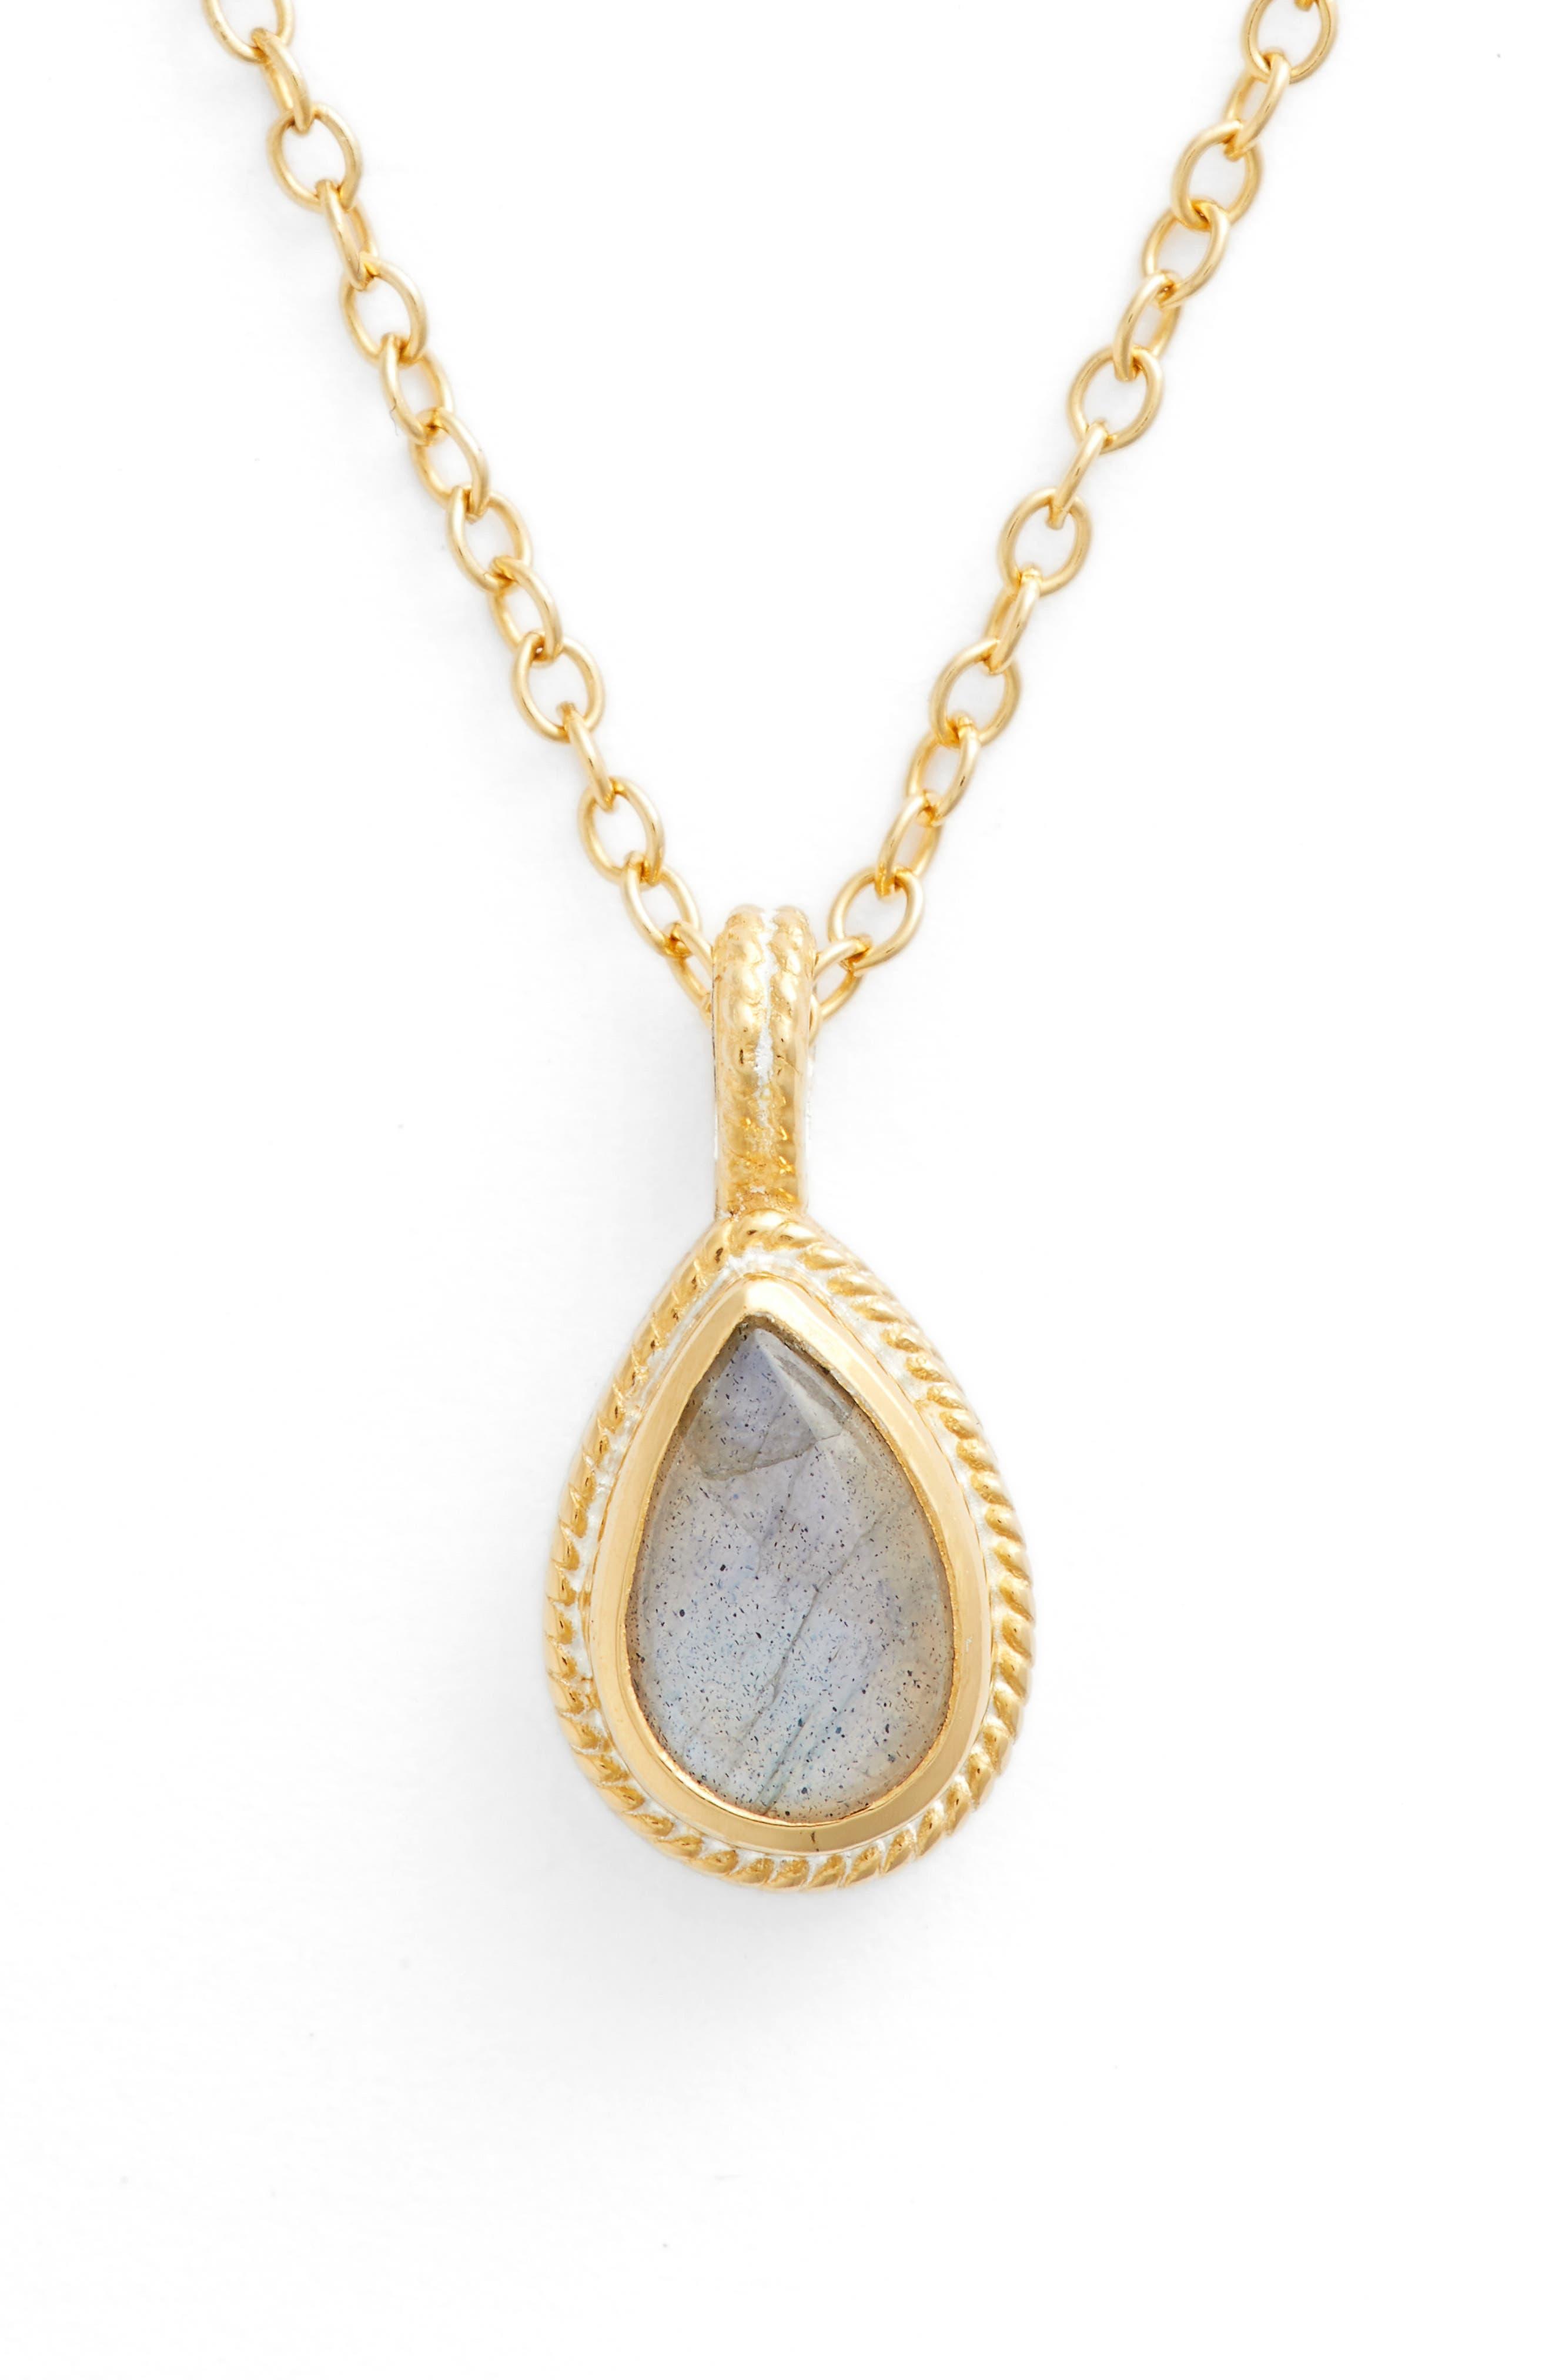 Semiprecious Stone Pendant Necklace,                             Main thumbnail 1, color,                             GOLD/ LABRADORITE